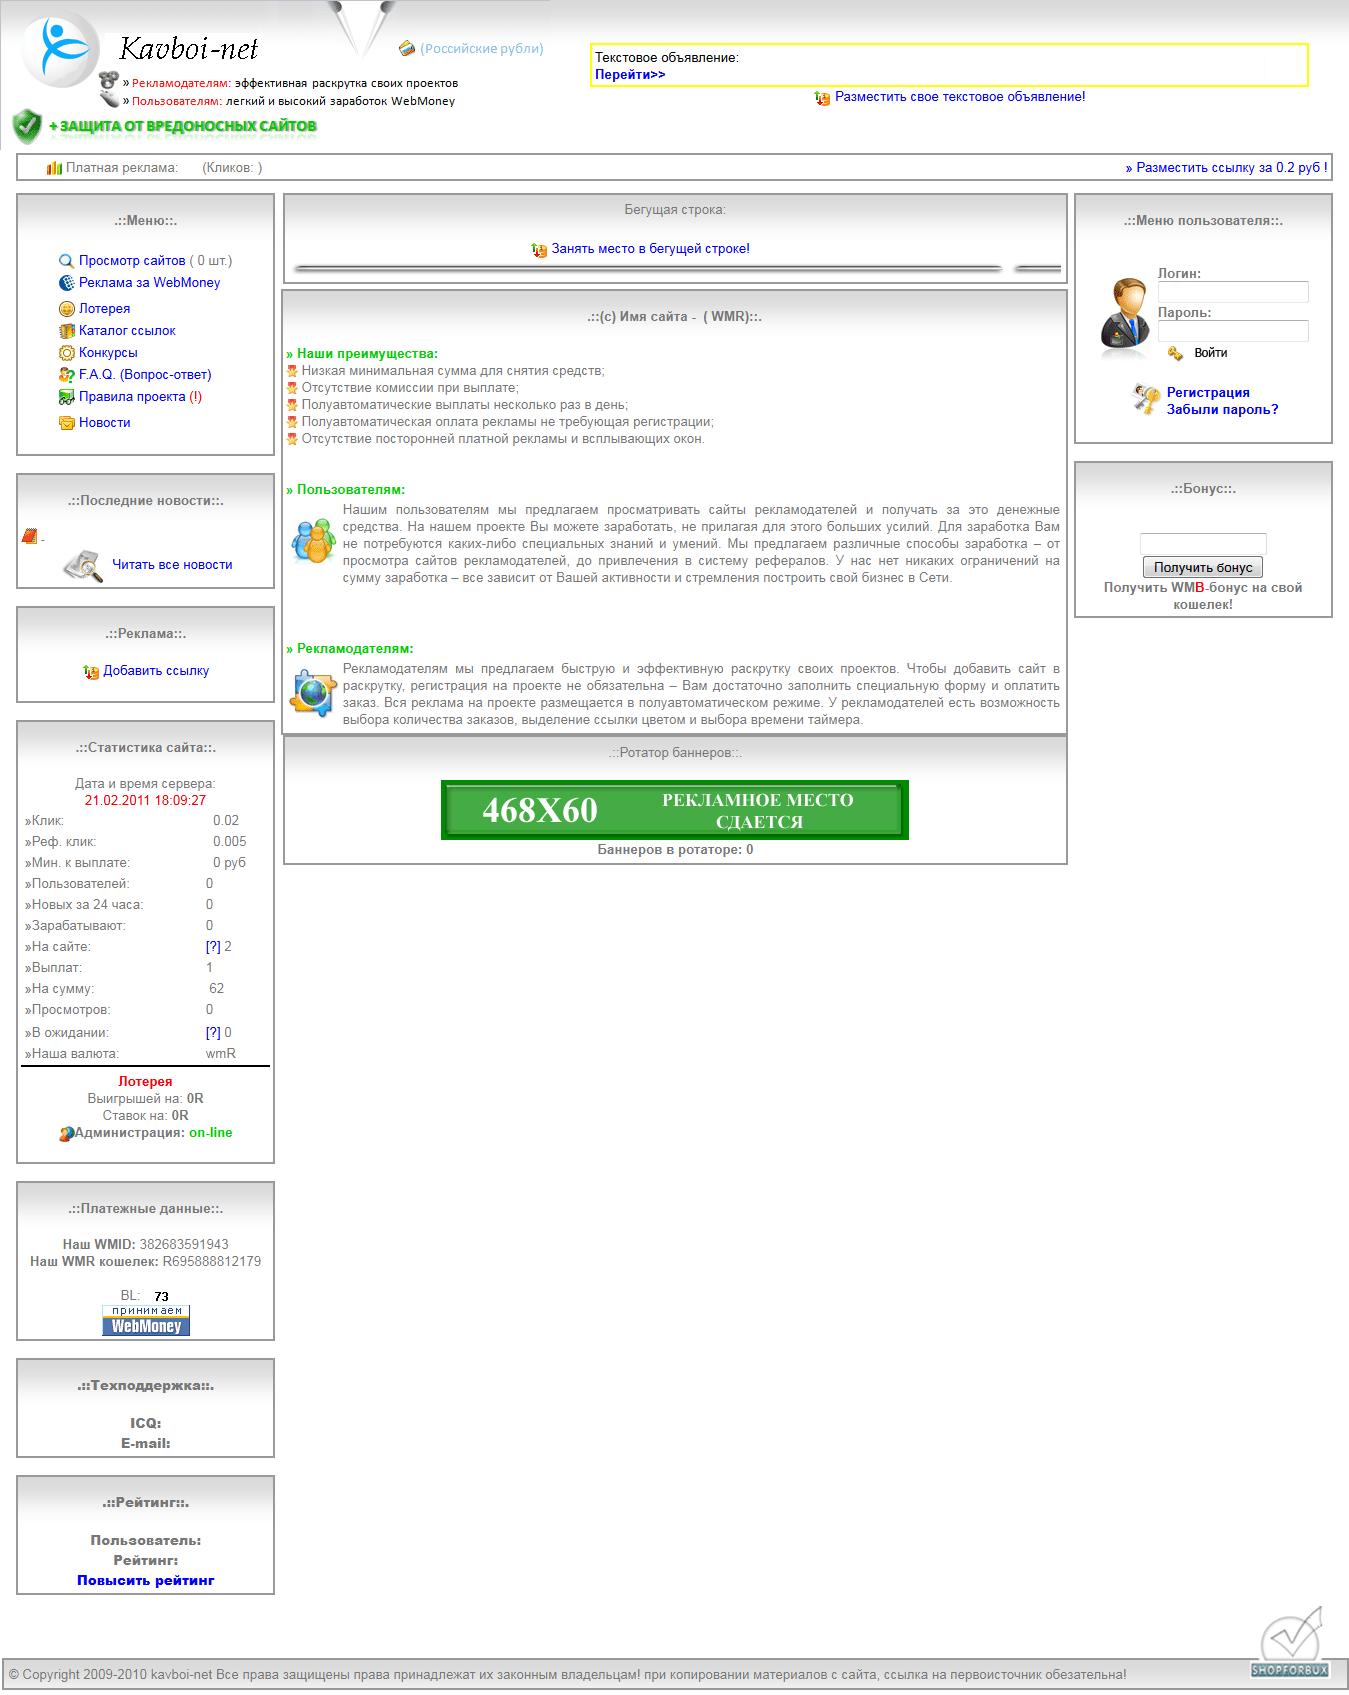 Скрипт Kavboi-net (Сборка кАсого)